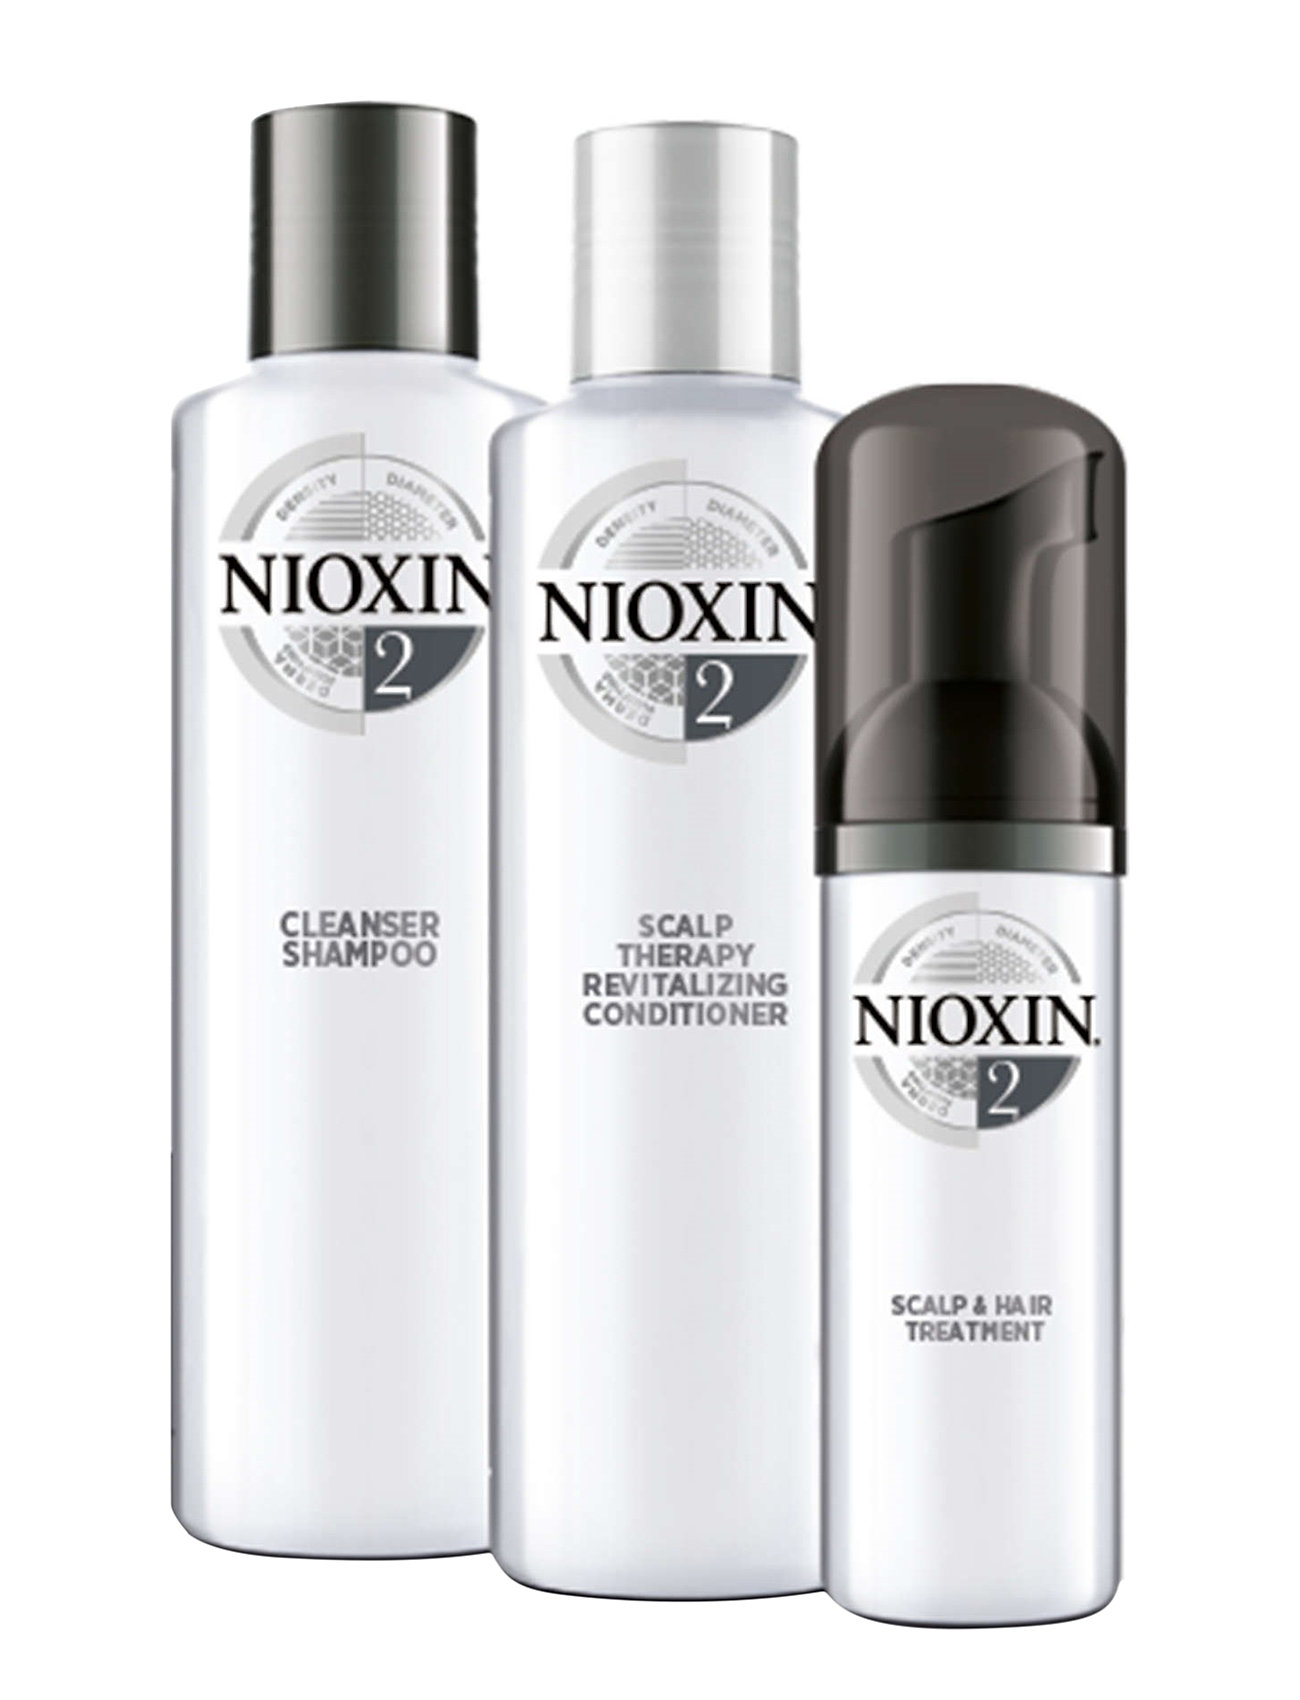 Nioxin TRIAL KIT SYSTEM 2 - NO COLOUR